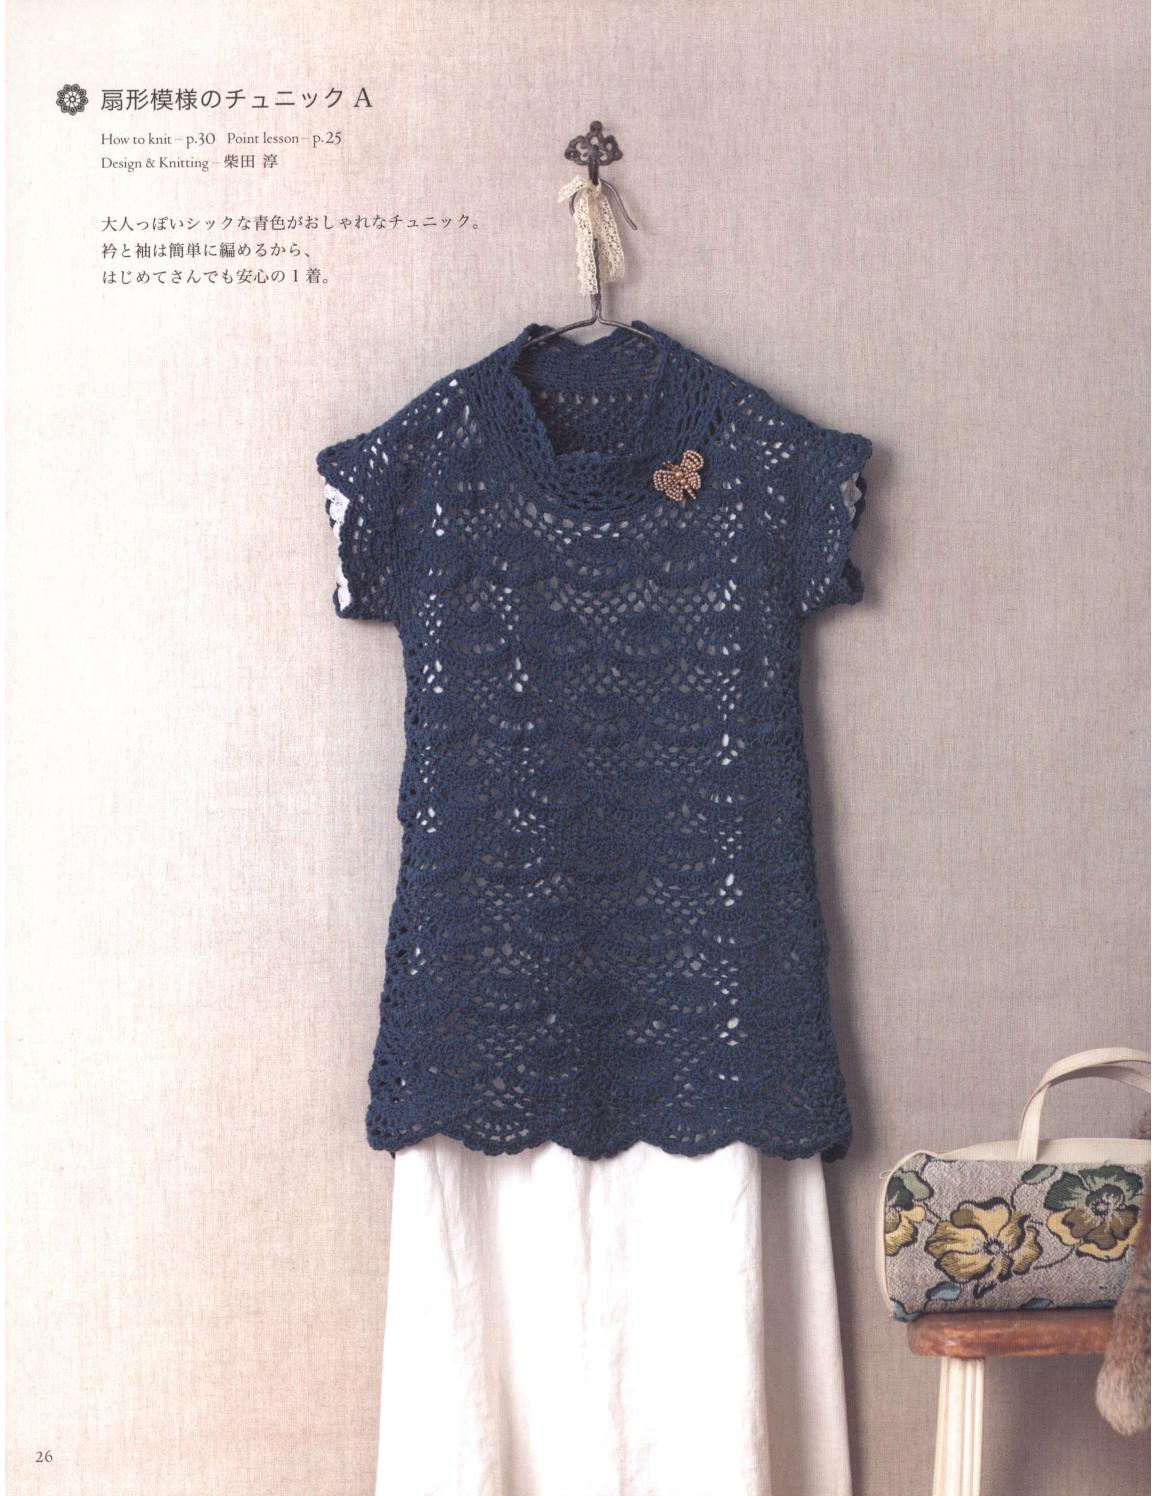 Asahi original crochet best selection 2012 page 26